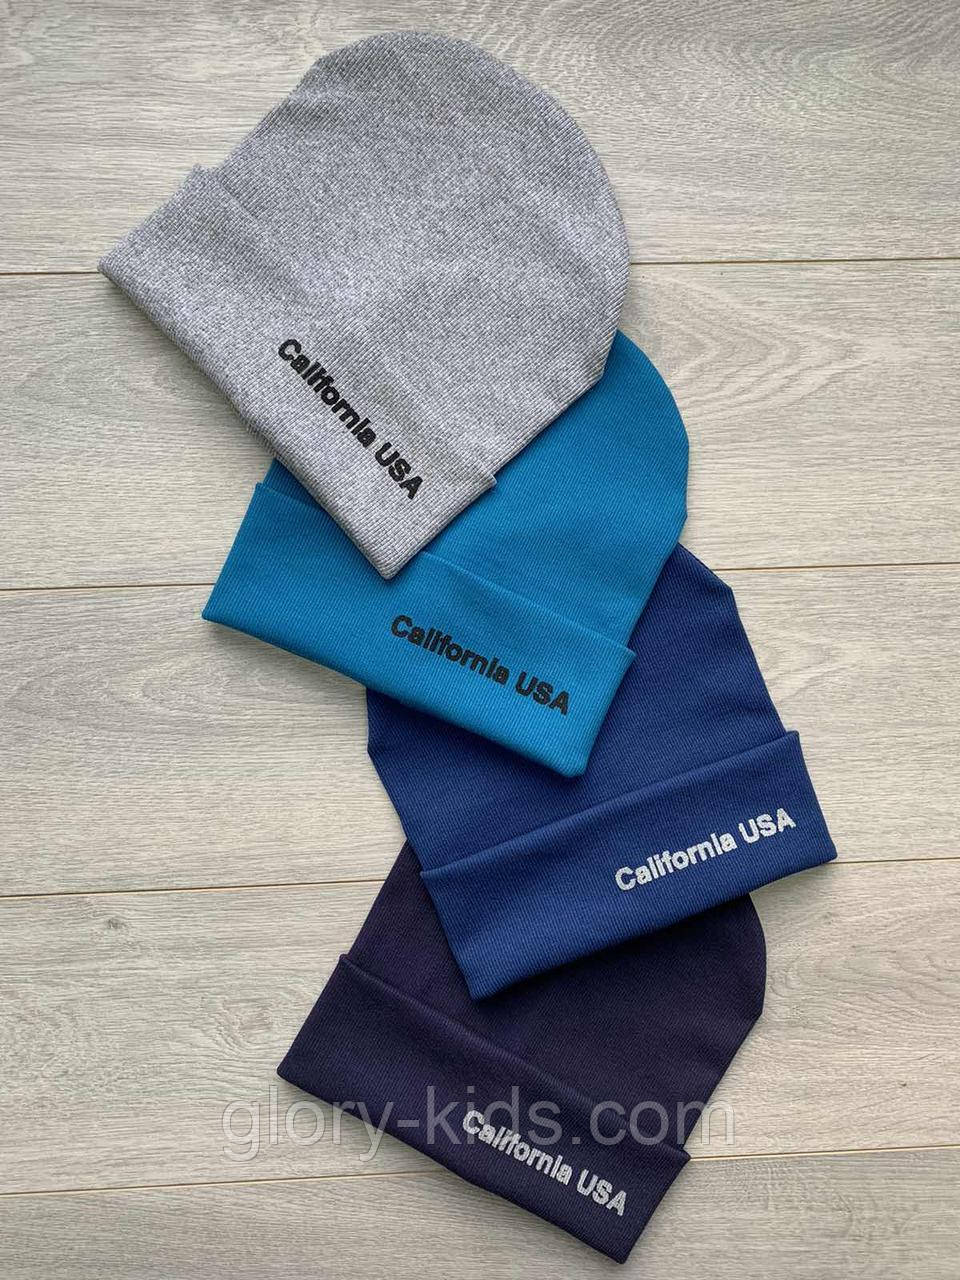 Трикотажная шапка подкладка х/б р52-54 5шт упаковка